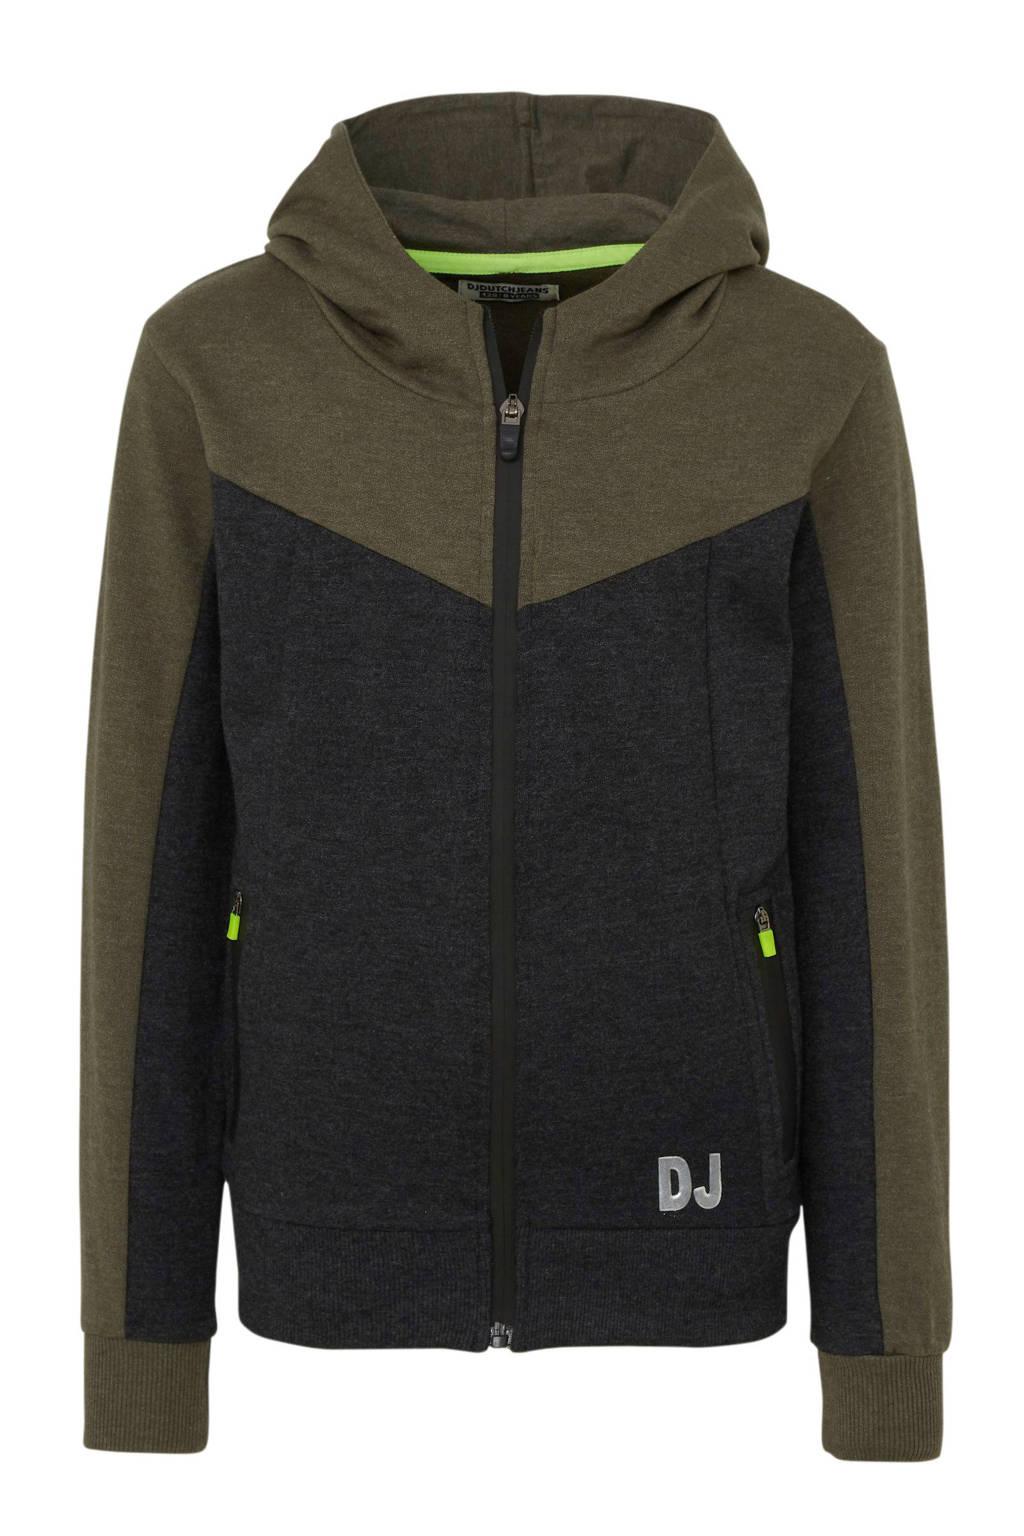 DJ Dutchjeans vest army groen/zwart mêlee, Army groen/zwart mêlee